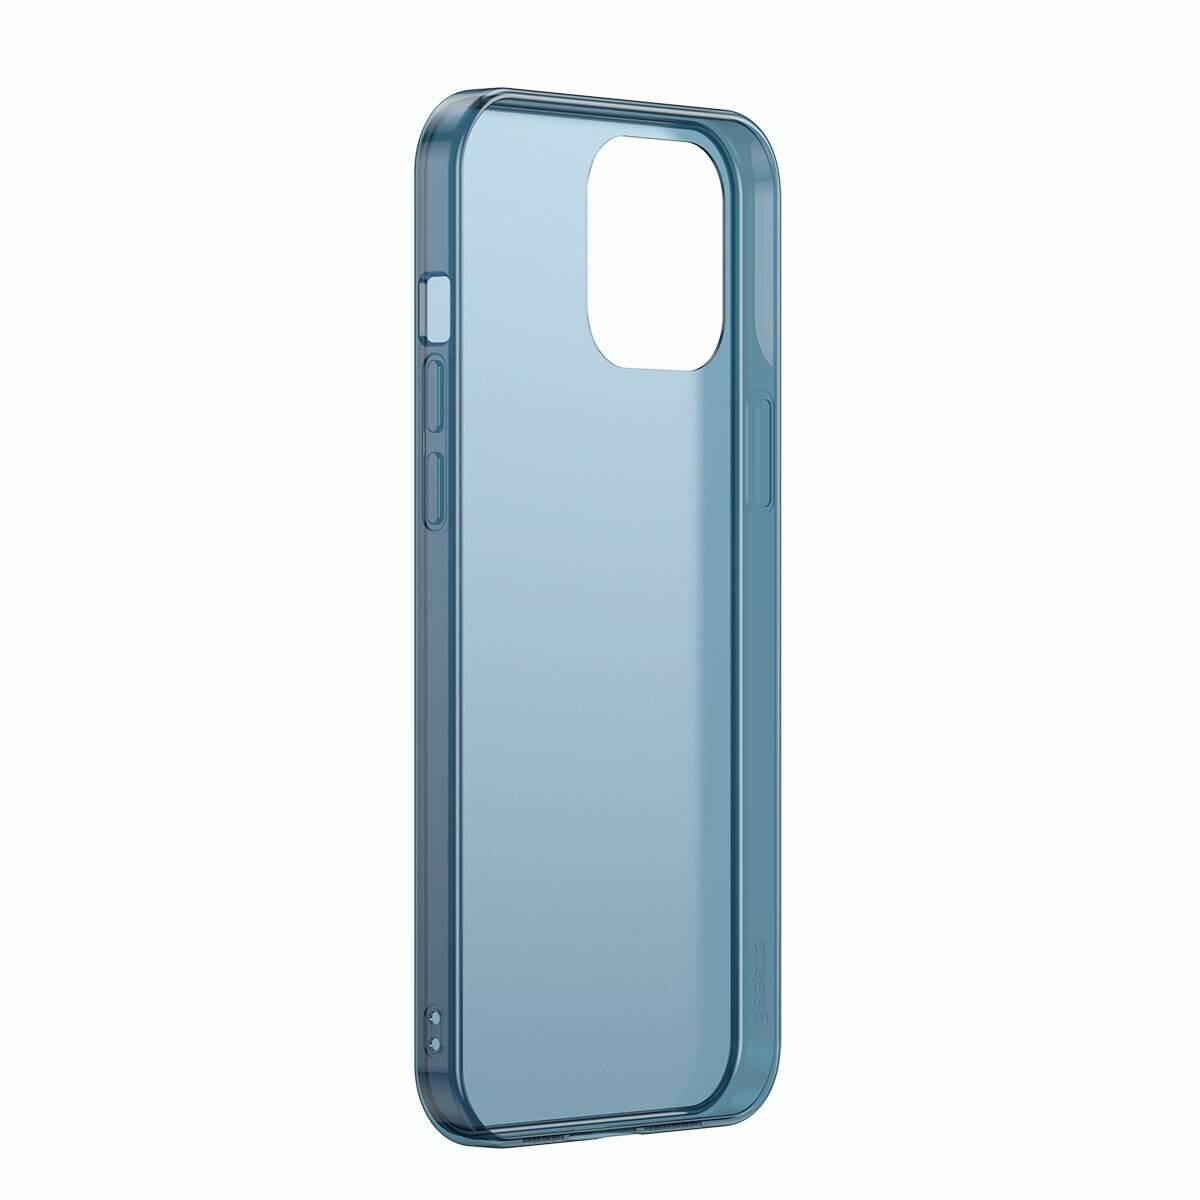 Baseus iPhone 12 mini tok, Frosted Glass, kék (WIAPIPH54N-WS03)